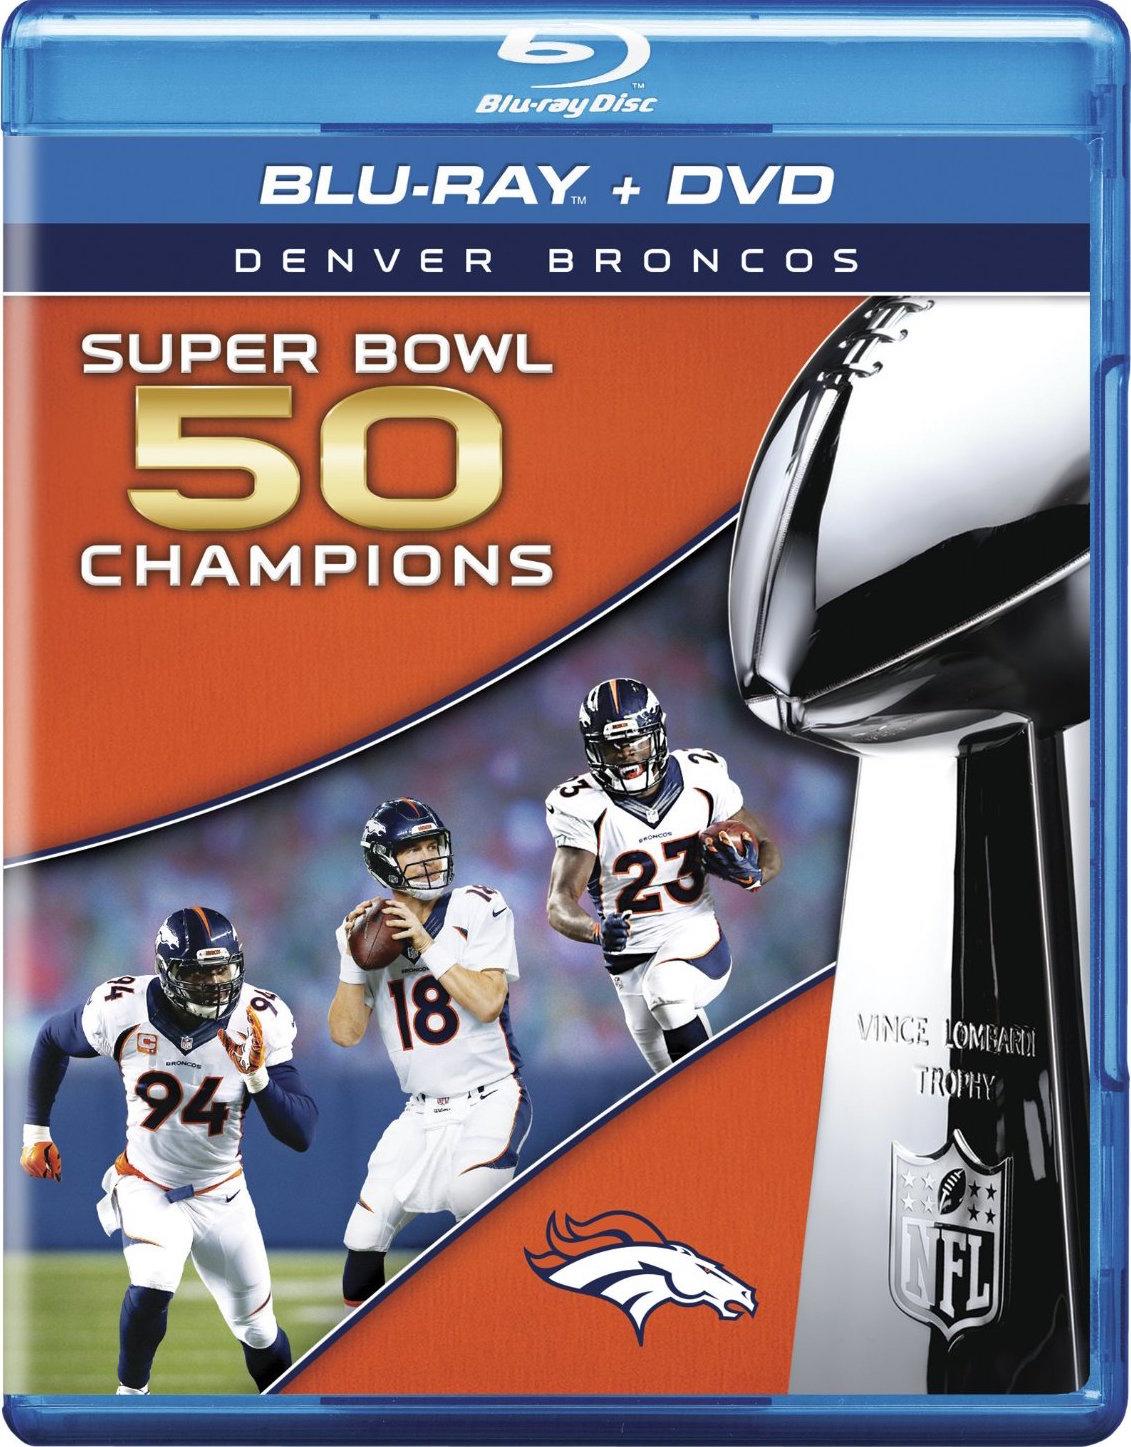 NFL Super Bowl 50 Champions: Denver Broncos (2016) Blu-ray